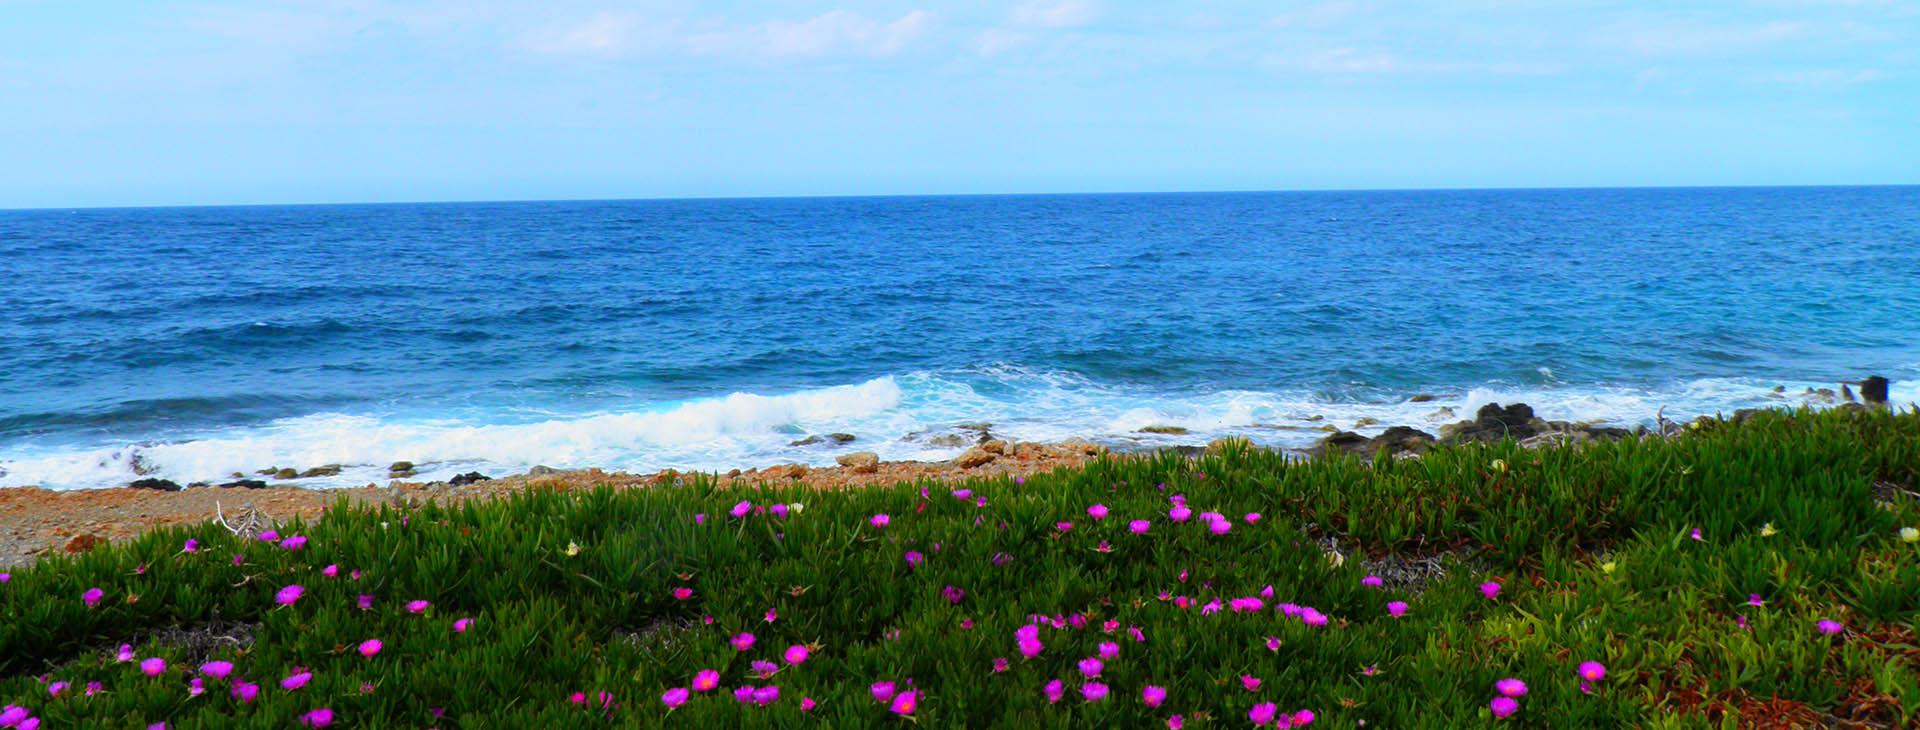 Beach near Sisi, Lassithi